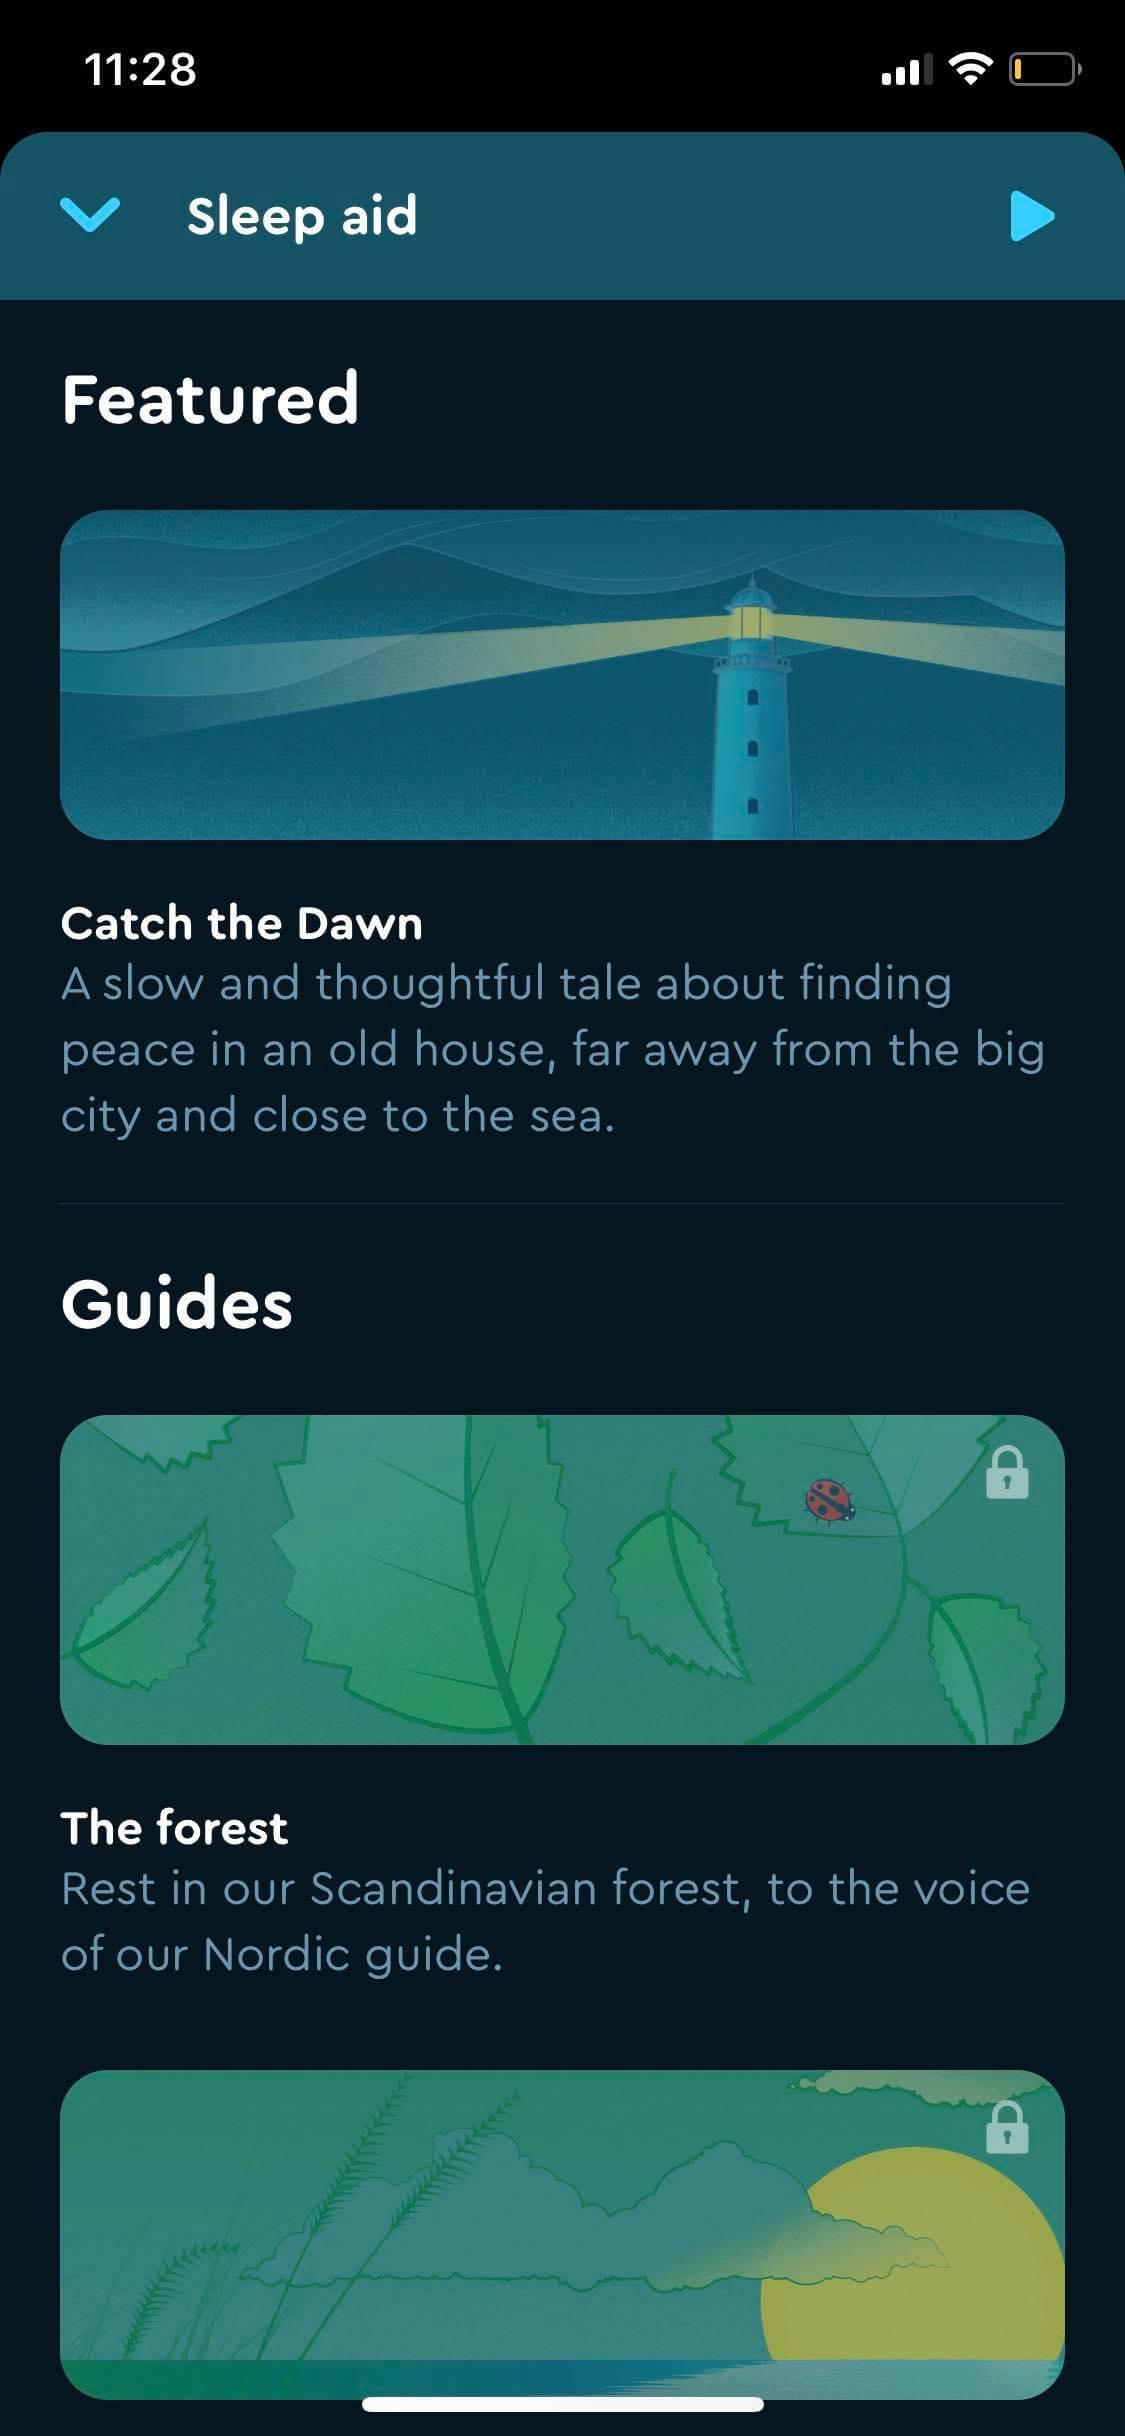 Sleep Aid on iOS by Sleep Cycle from UIGarage